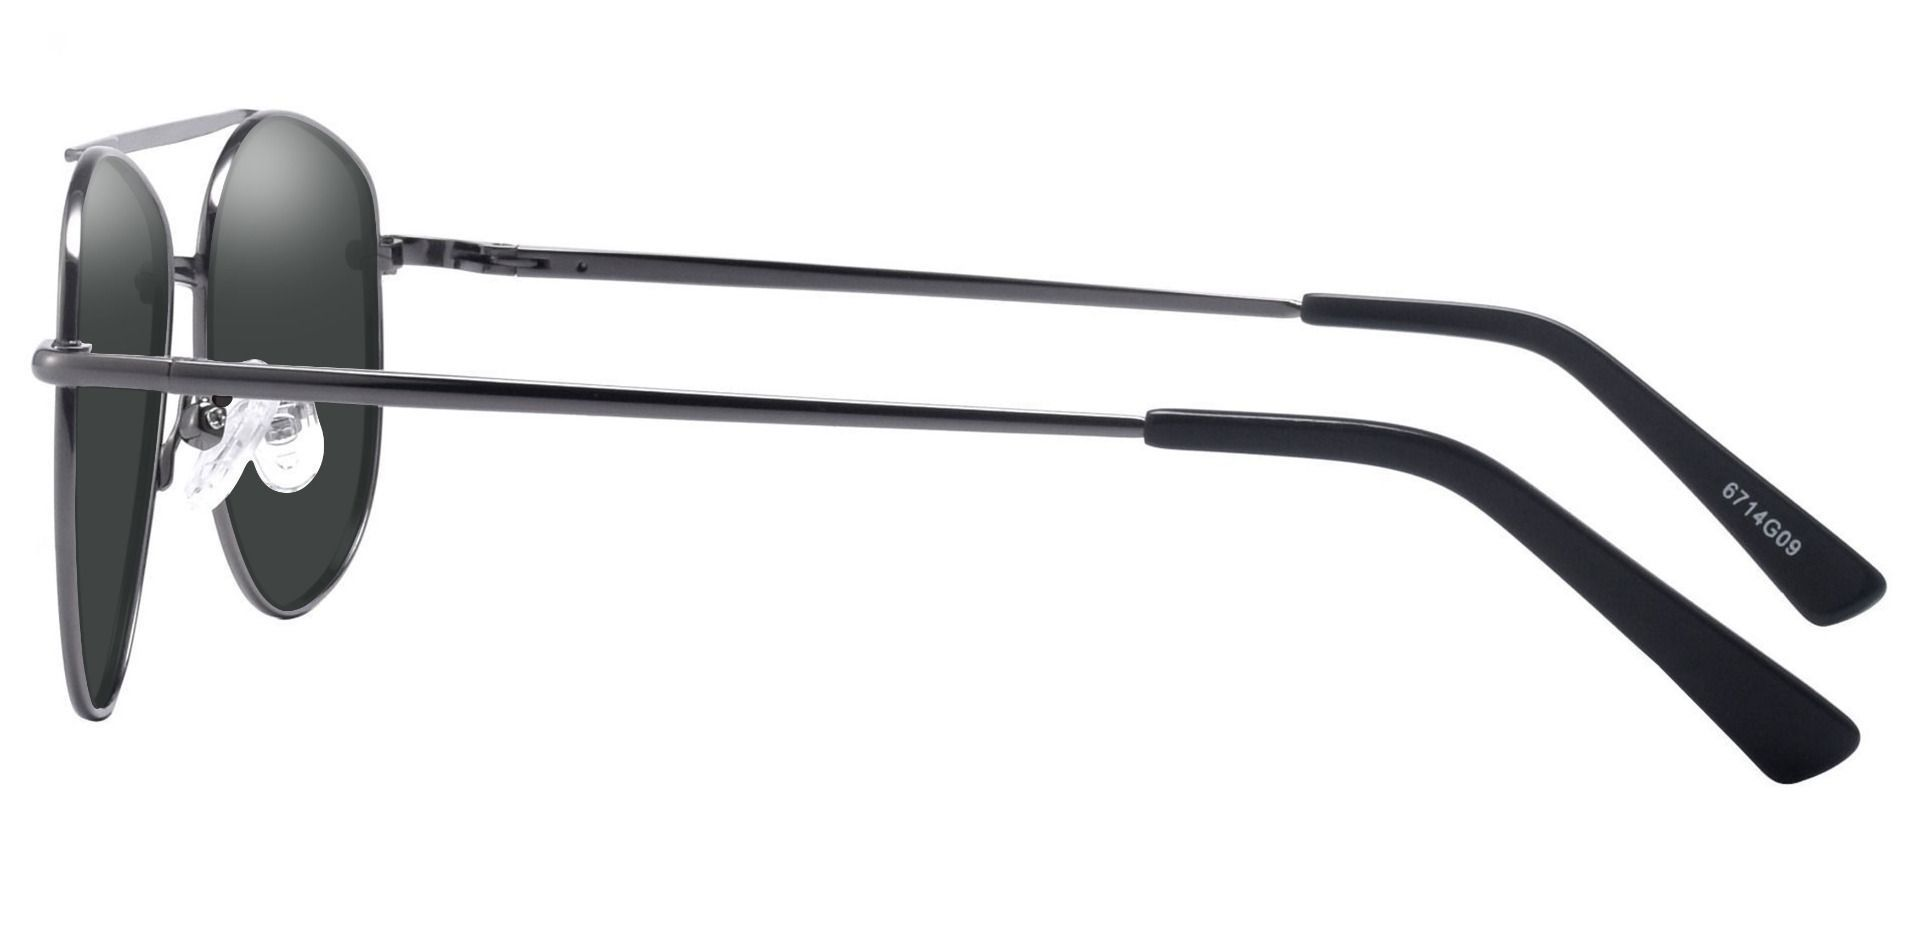 Dwight Aviator Prescription Sunglasses - Gray Frame With Gray Lenses